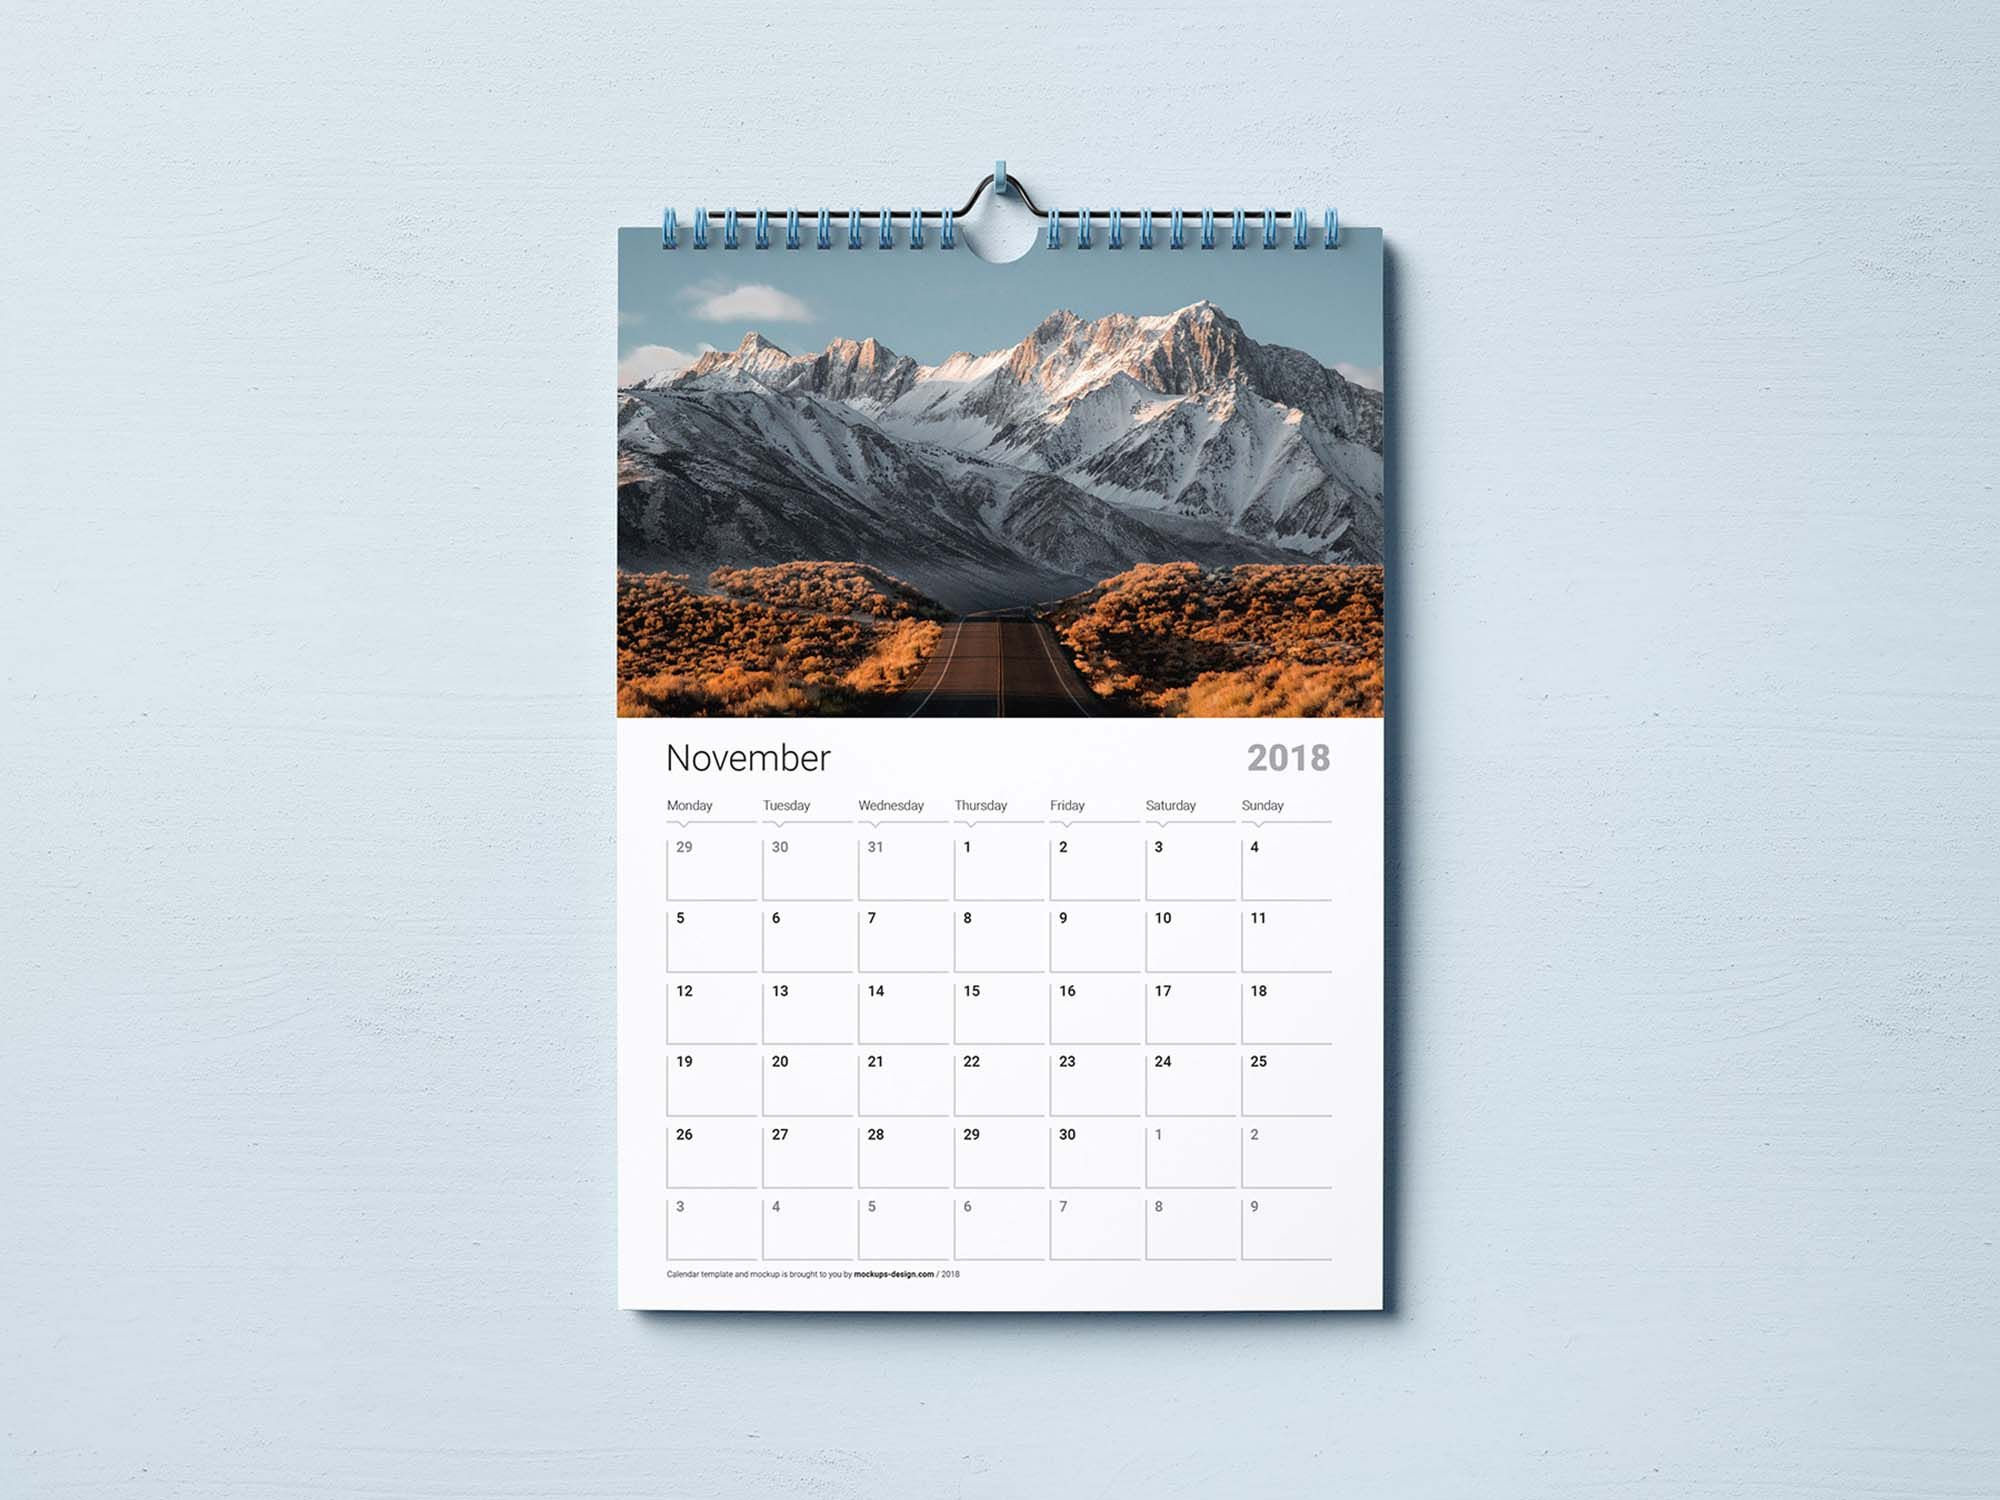 Free Wall Calendar Mockup Template Psd Free Wall Calendar Wall Calendar Design Wall Calendar